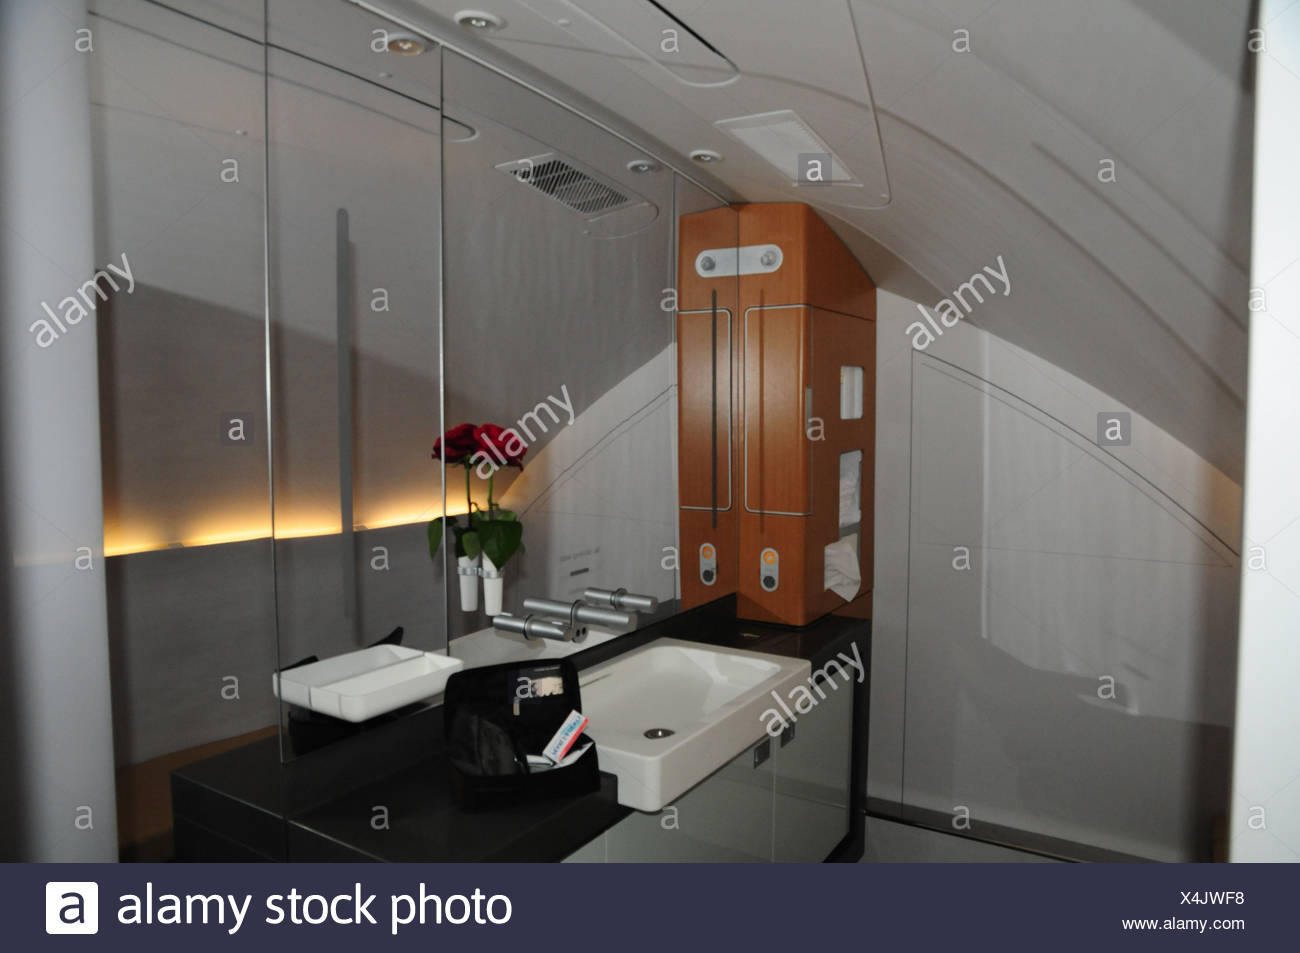 Lampade da bagno leroy merlin mobili cucina leroy merlin